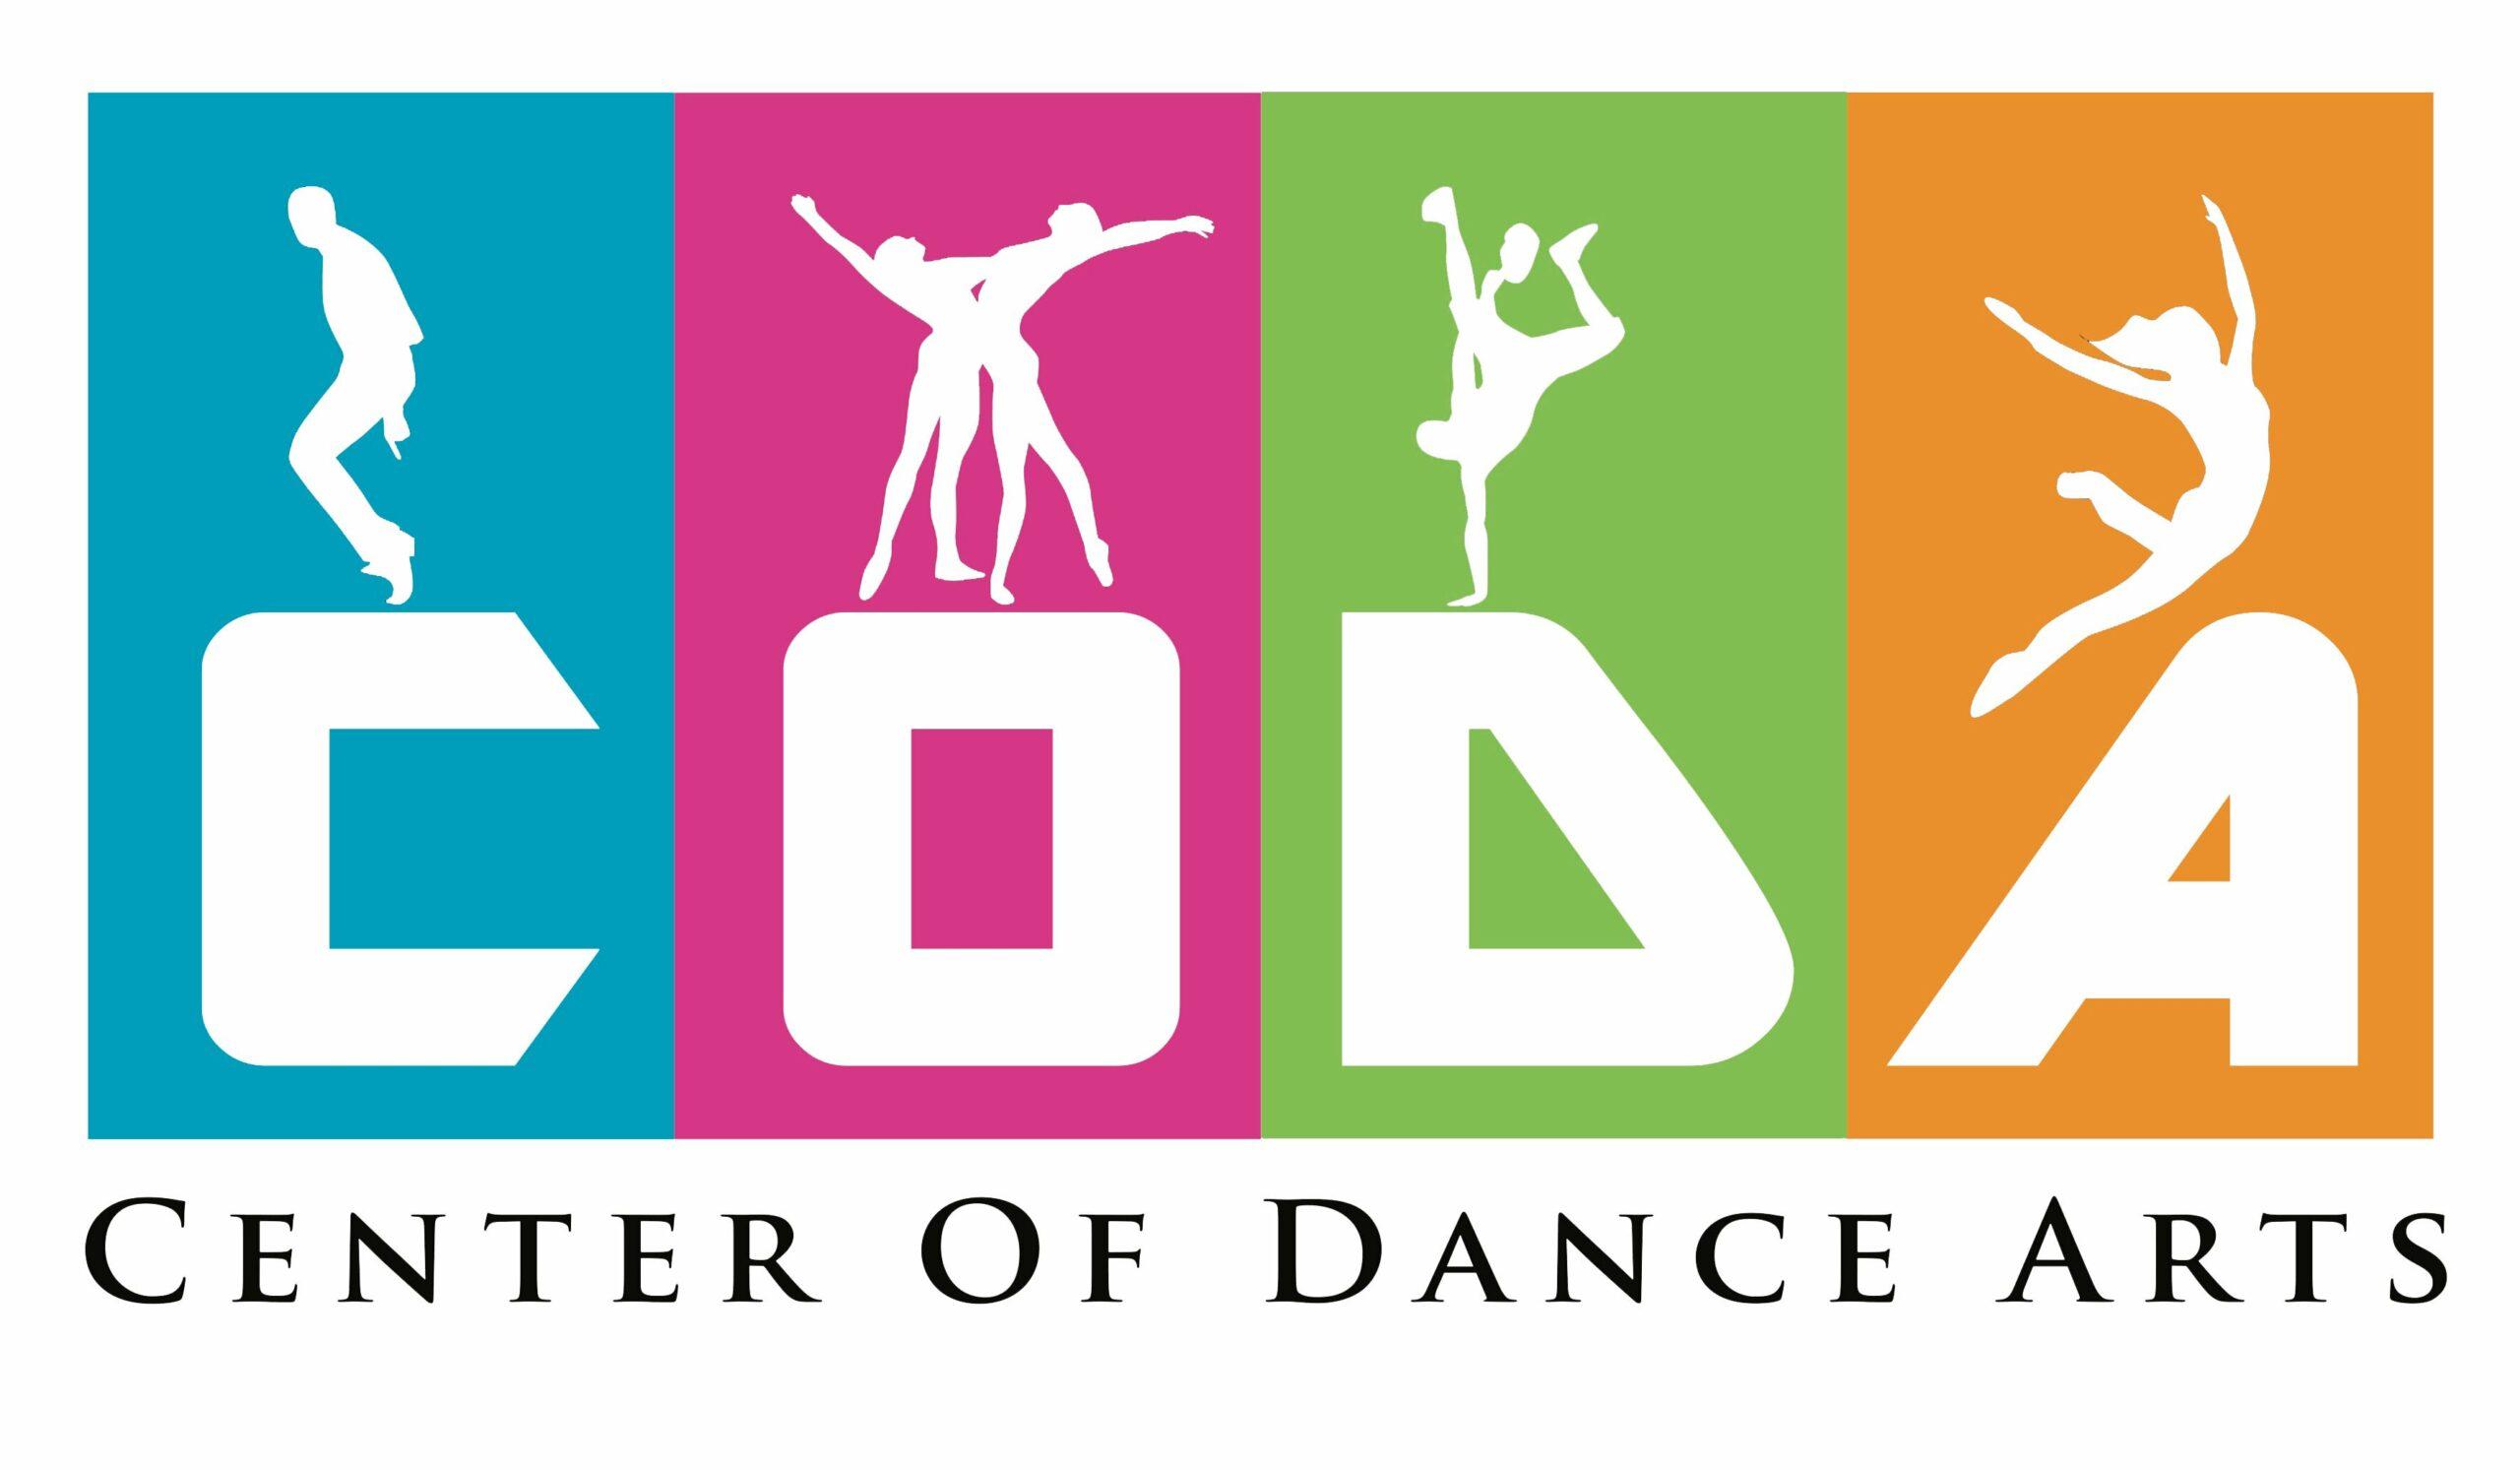 Center of Dance Arts